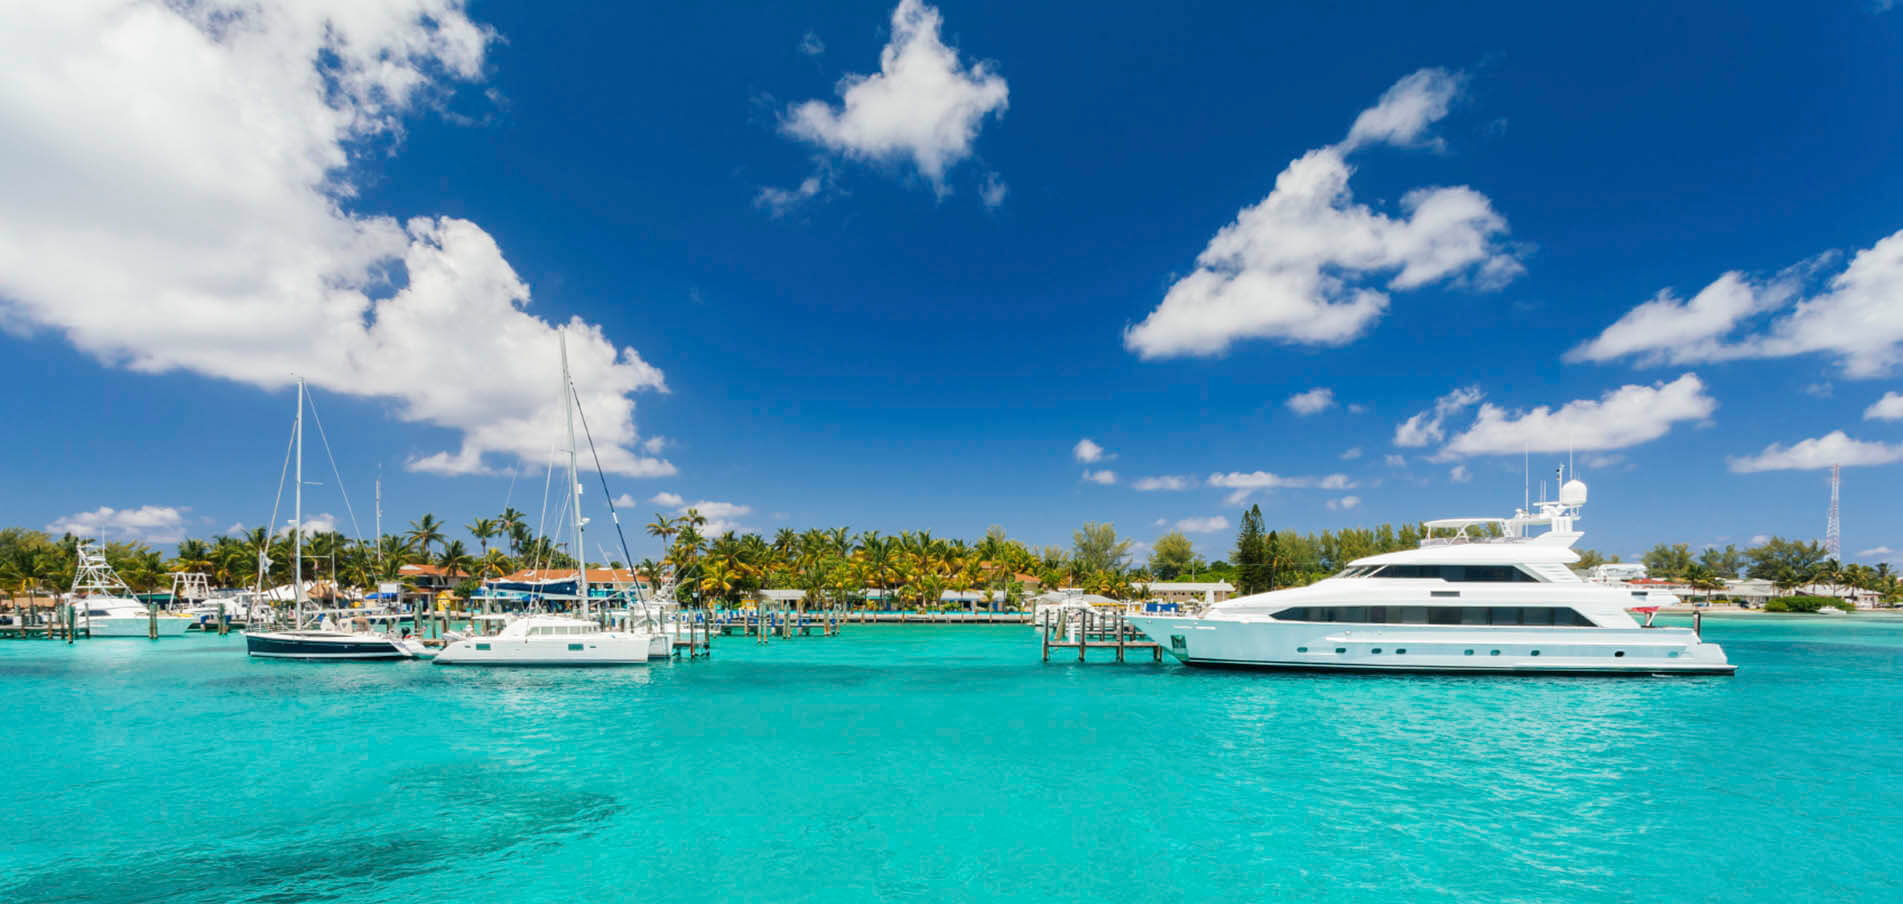 Location de yacht de luxe Bahamas